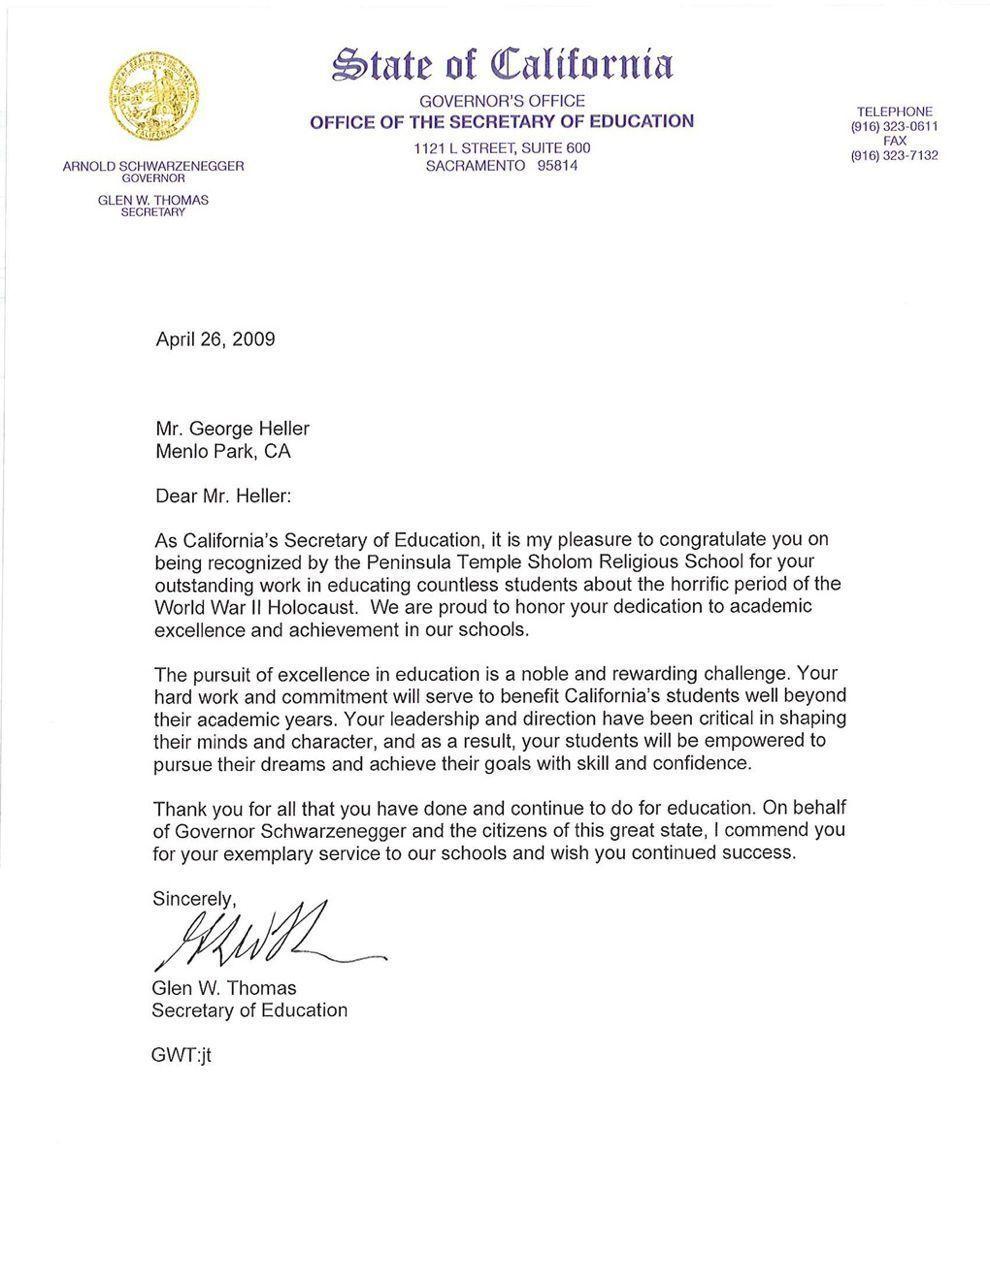 Formal Invitation Event Letter  Email wedding invitations